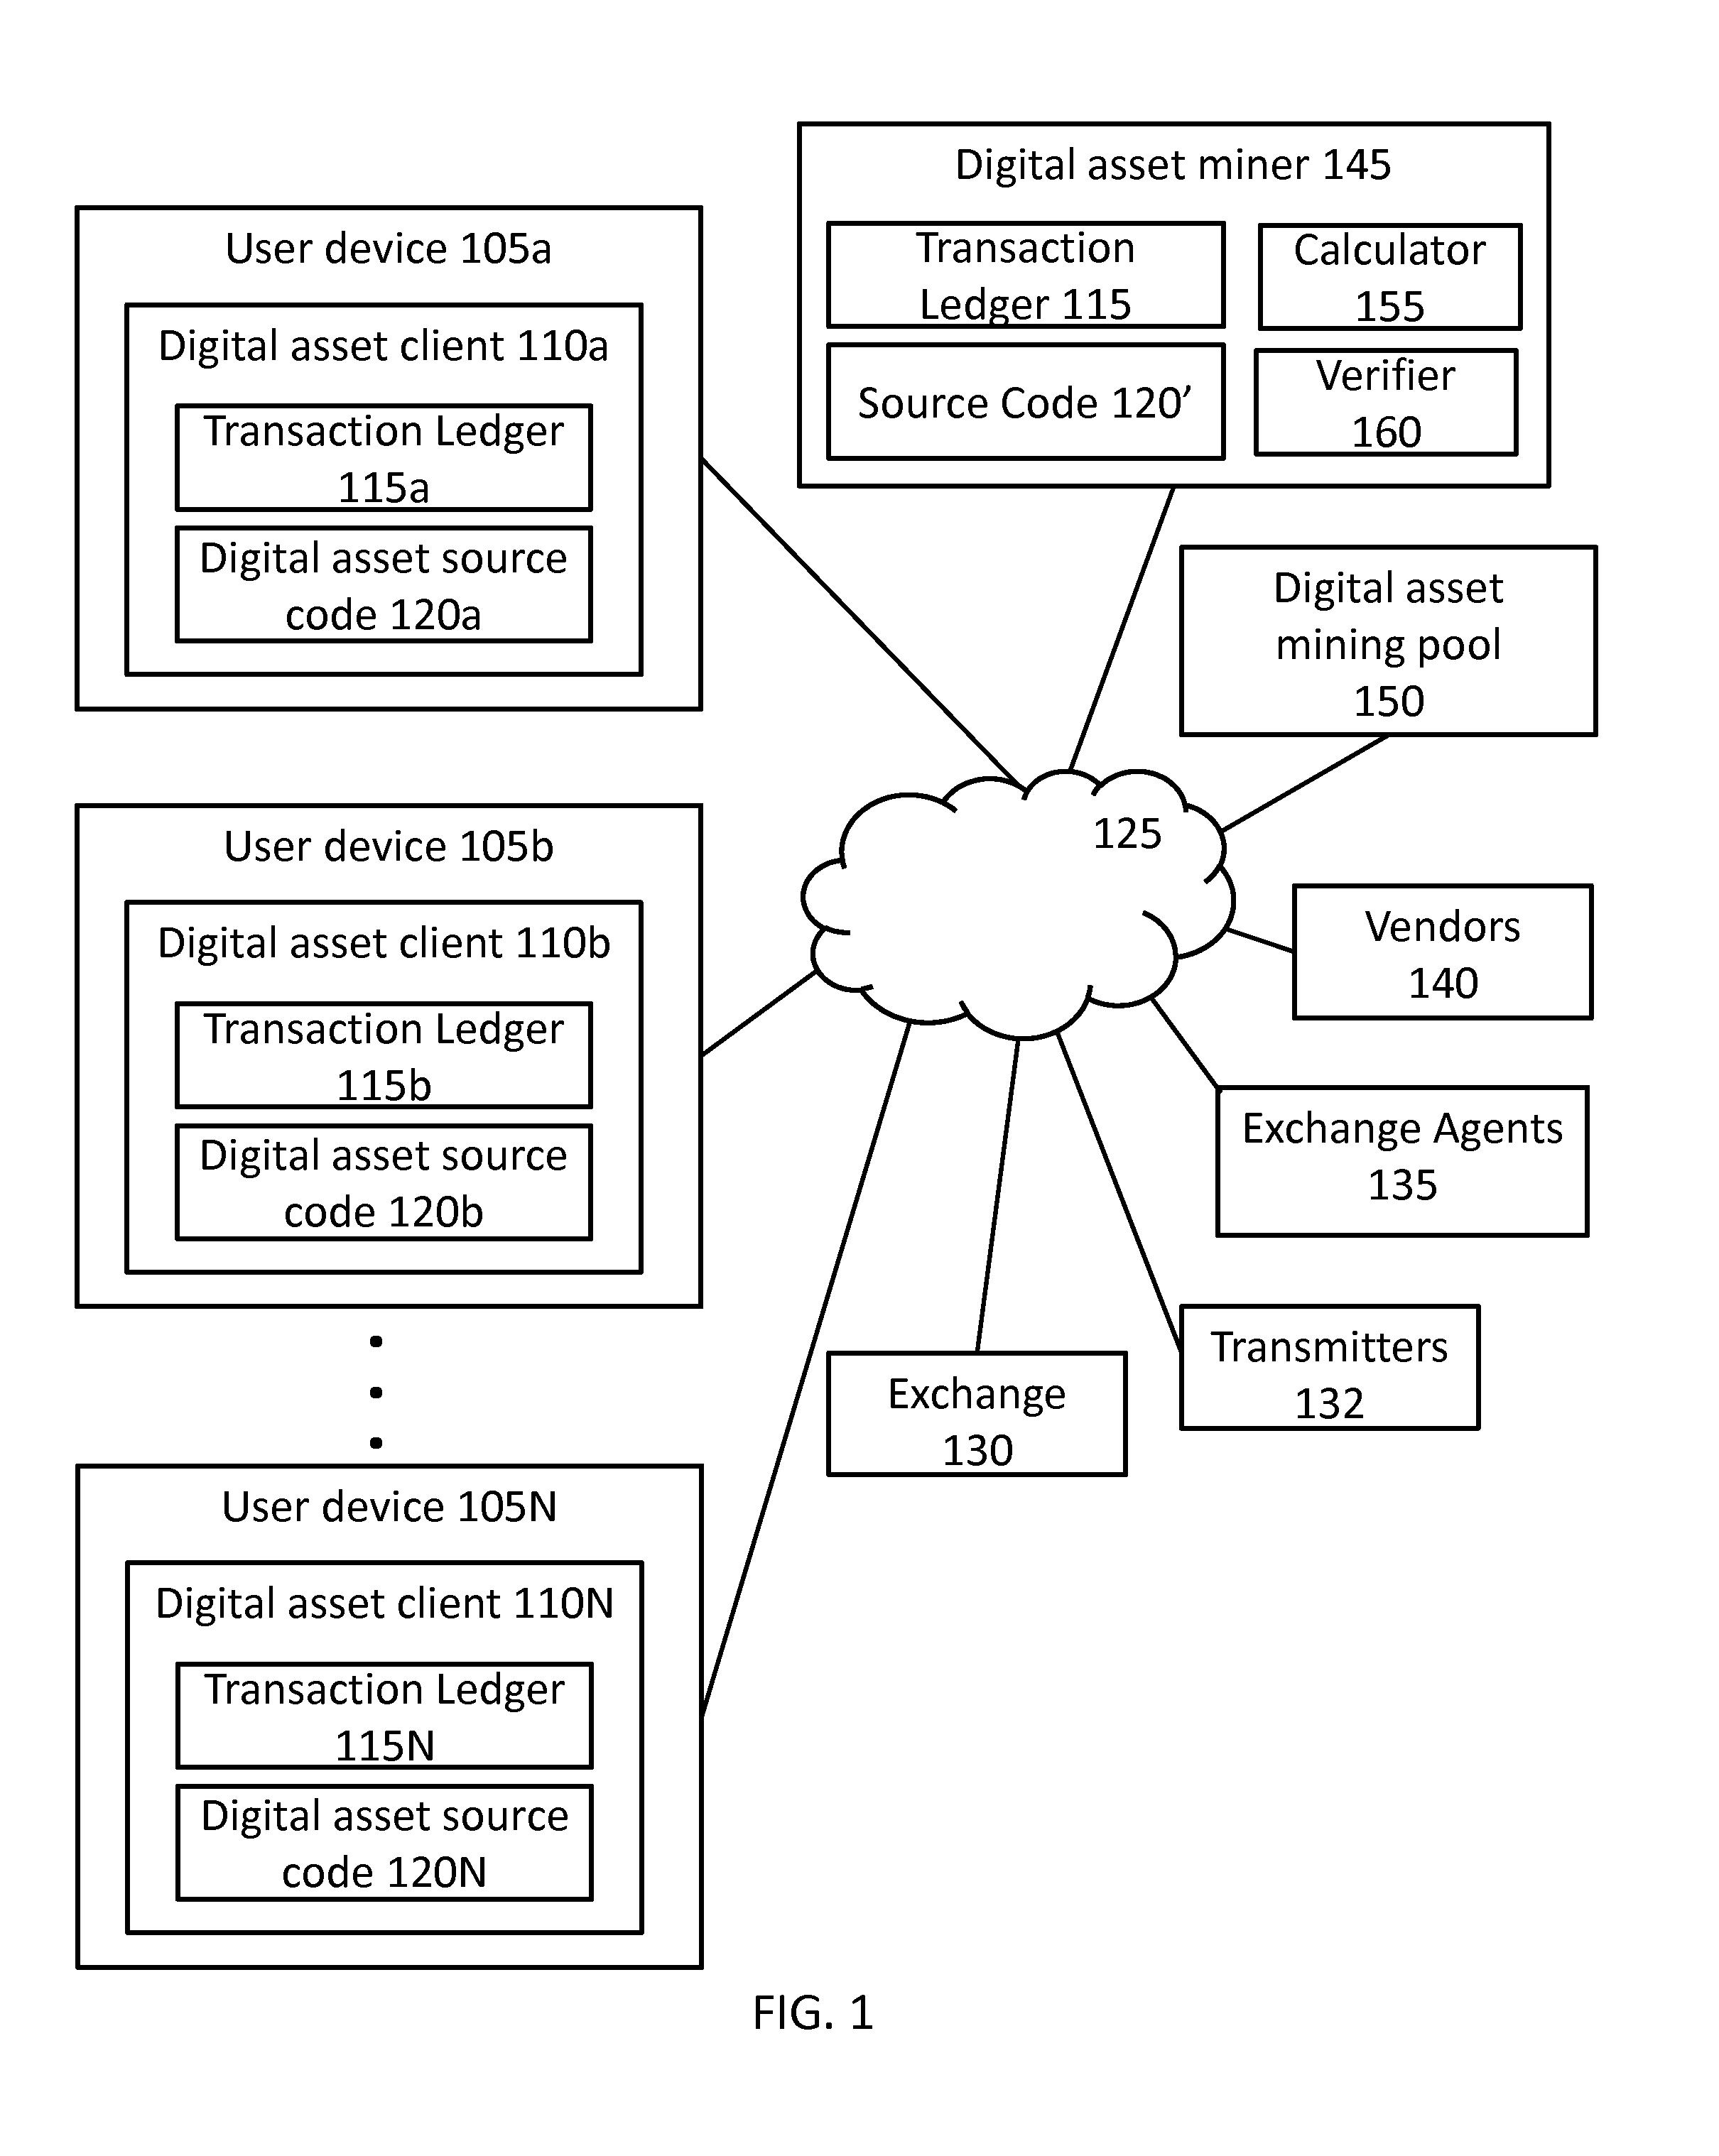 Patent US 9,965,805 B1